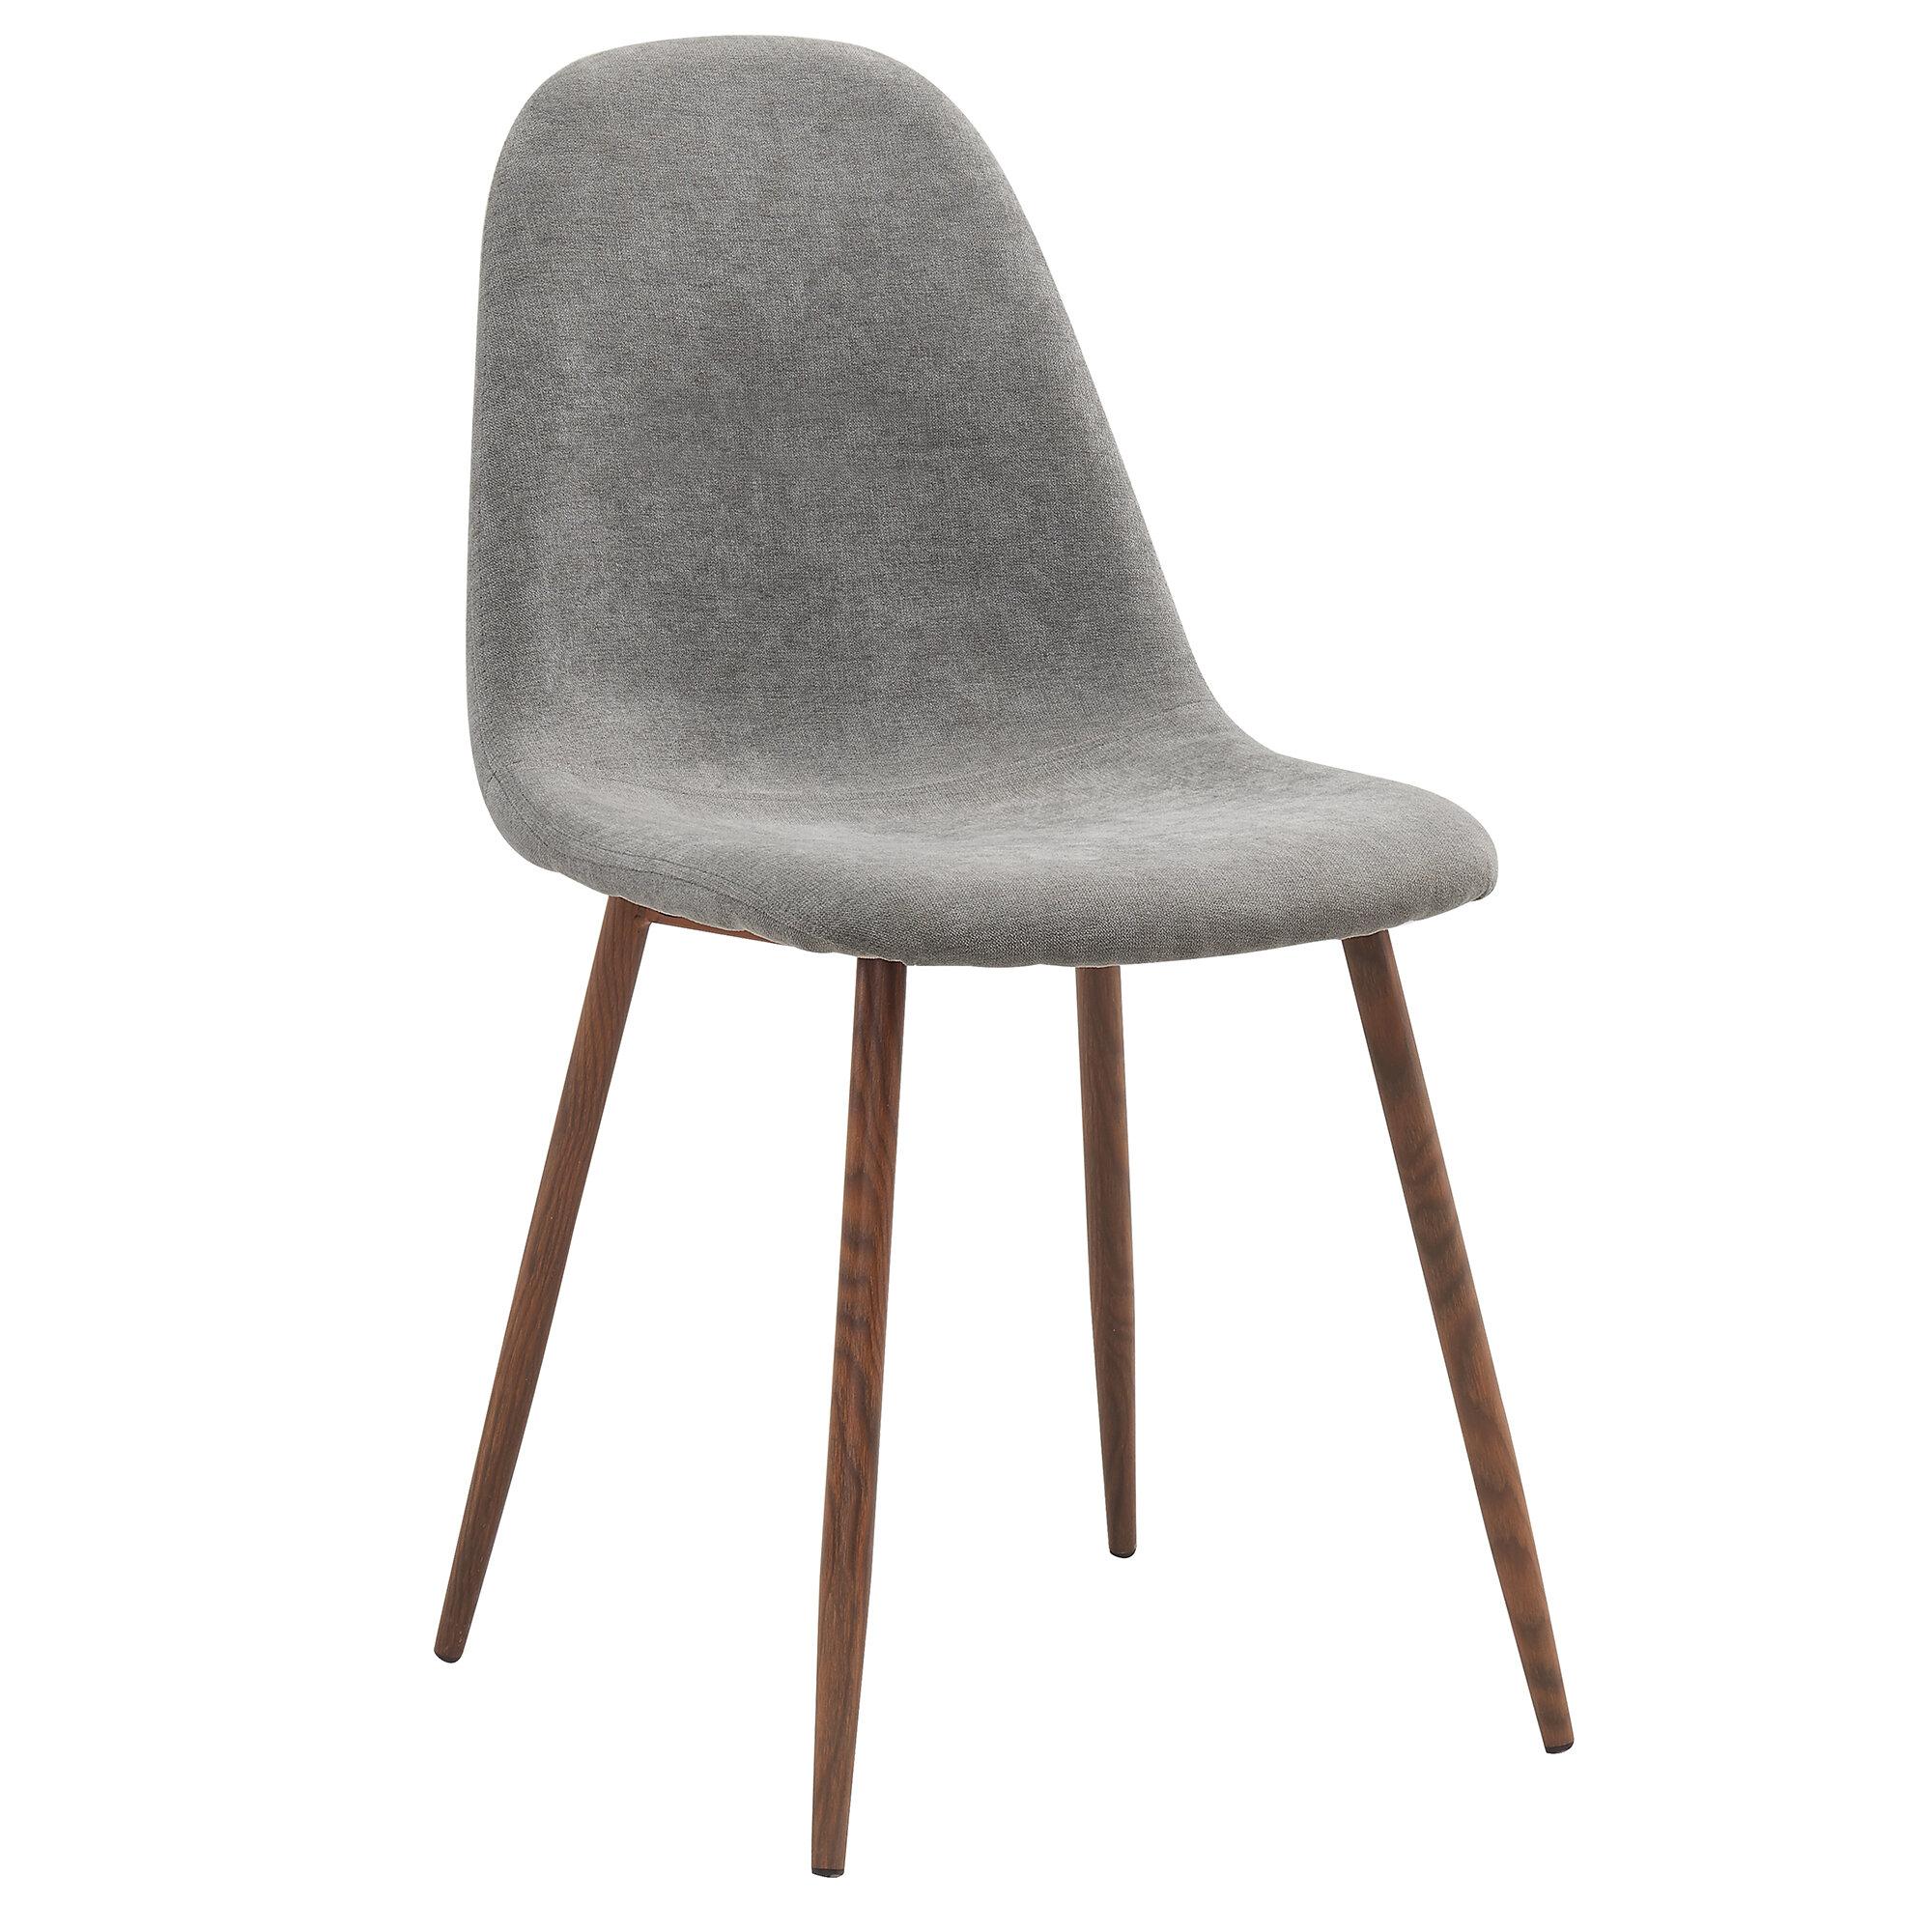 Wade Logan Folsom Upholstered Dining Chair U0026 Reviews | Wayfair